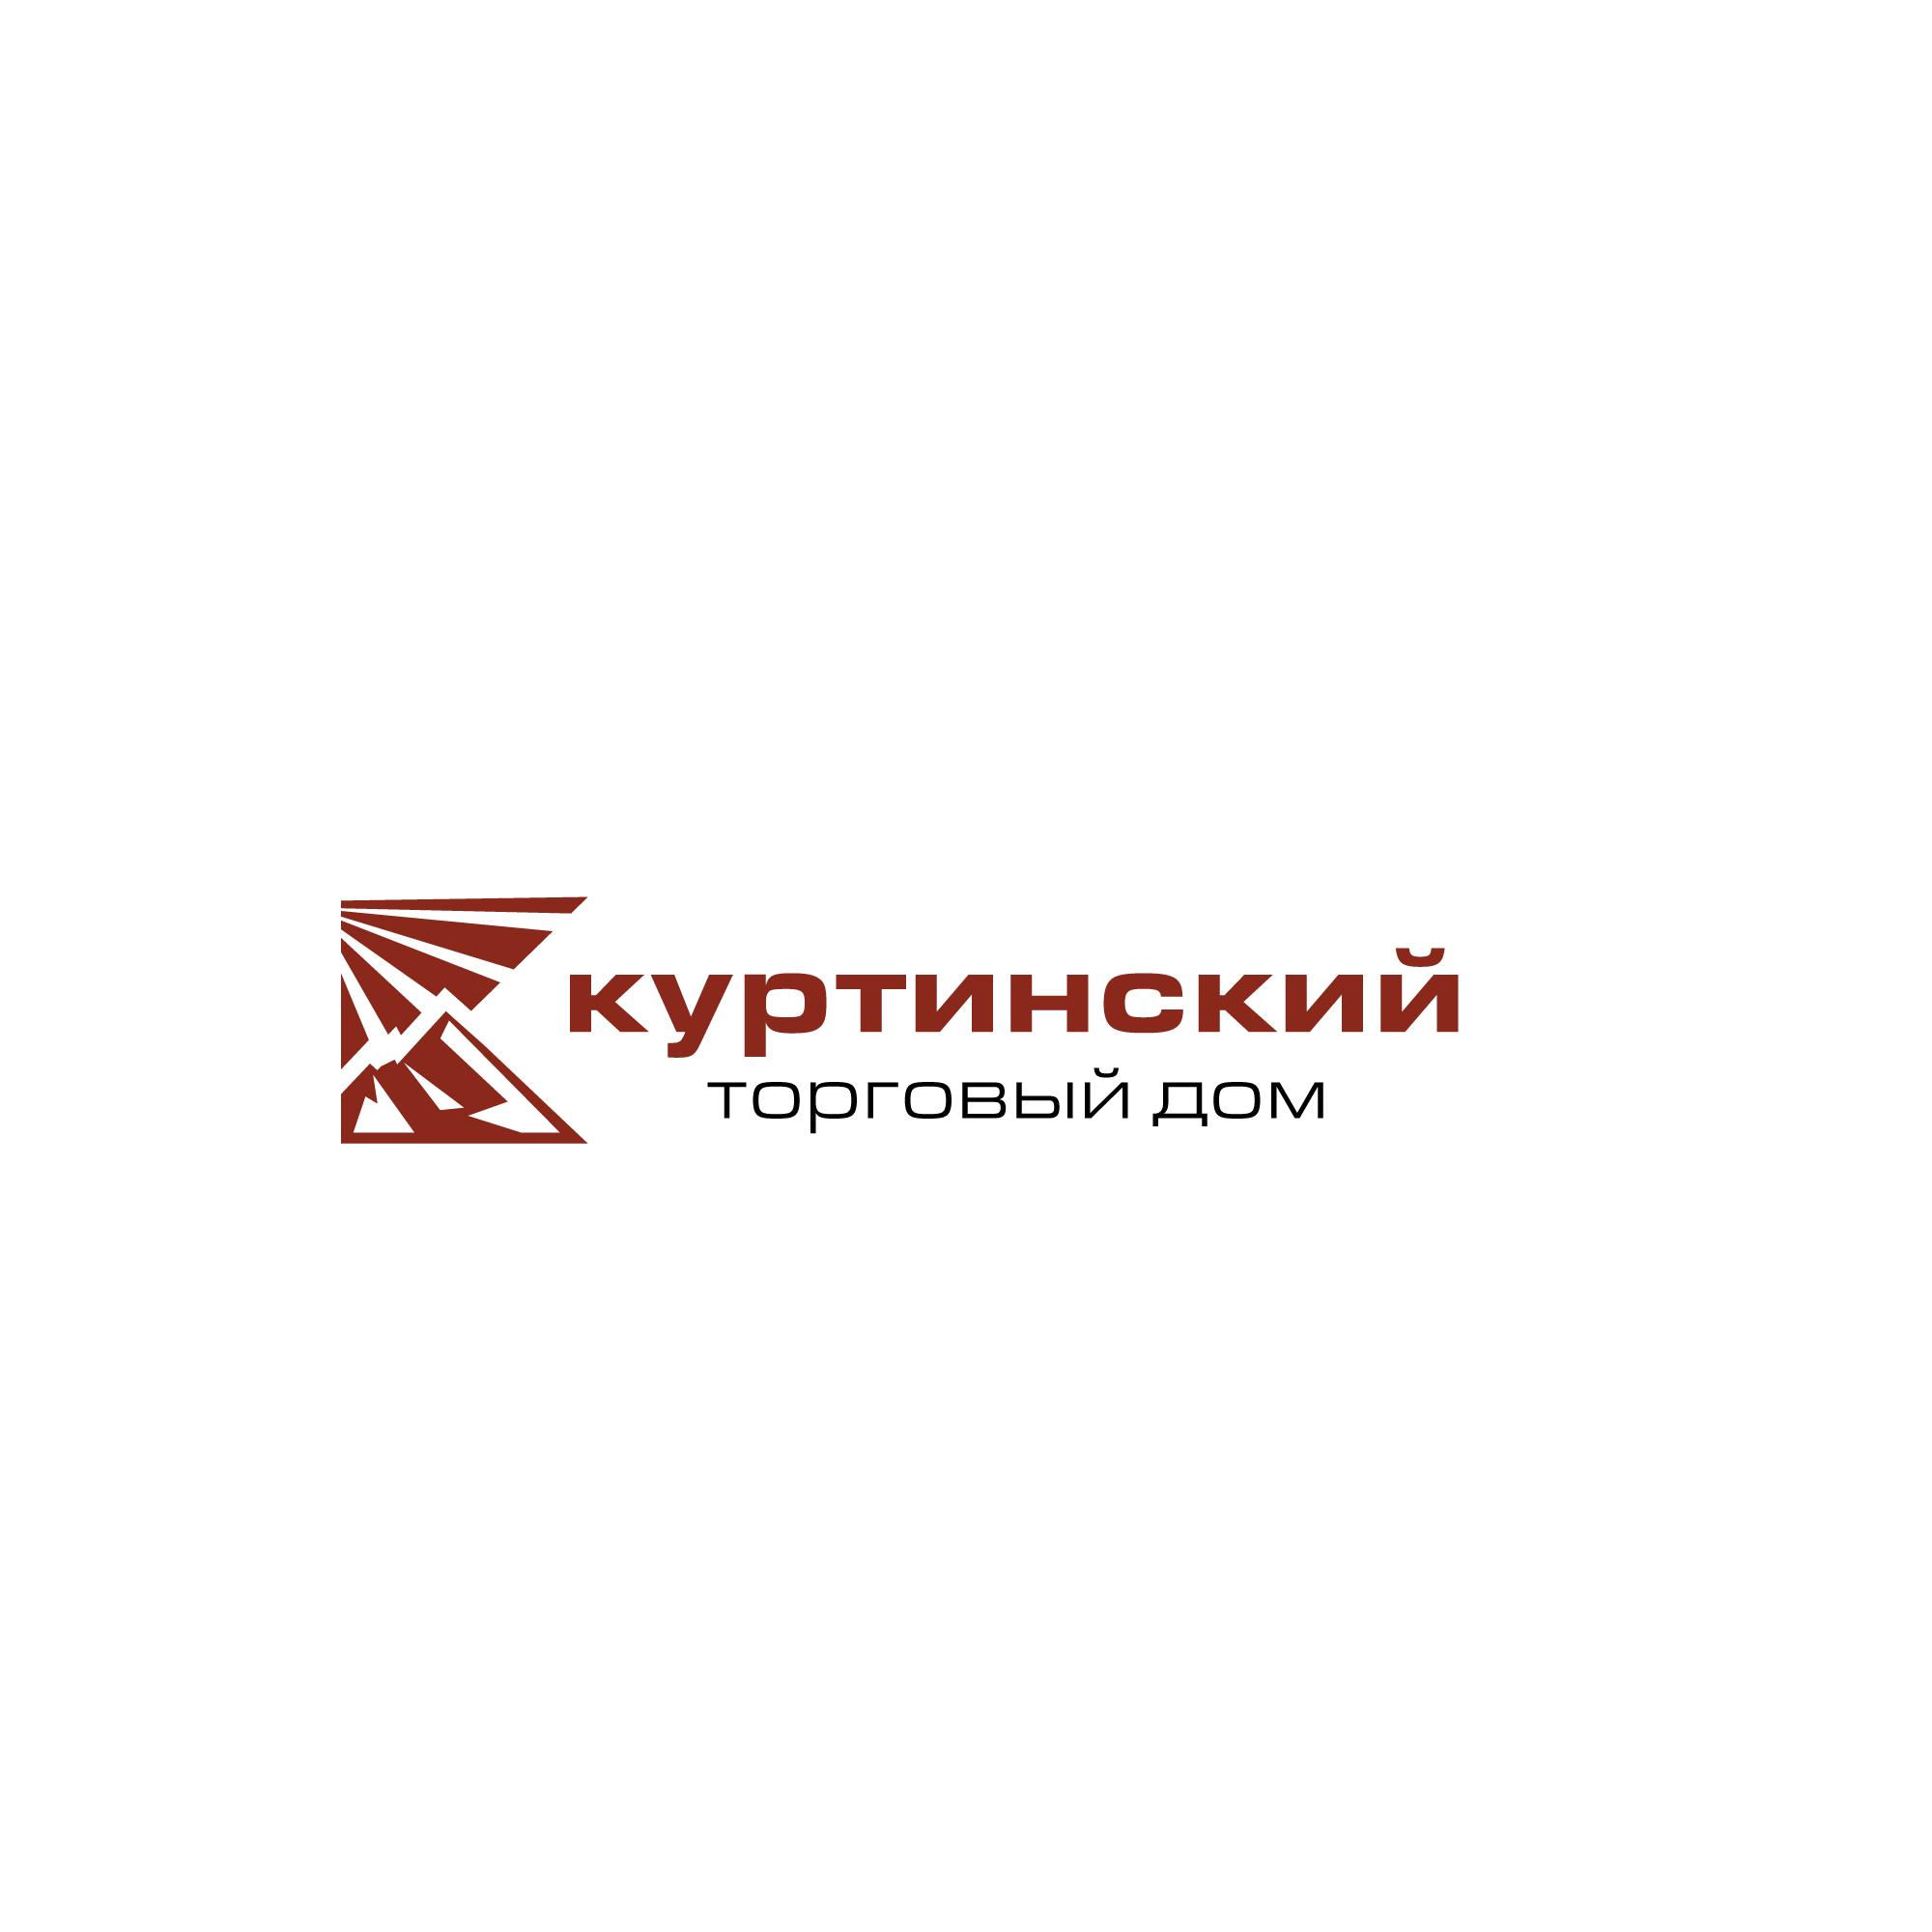 Логотип для камнедобывающей компании фото f_1325b9938a85f1f0.jpg